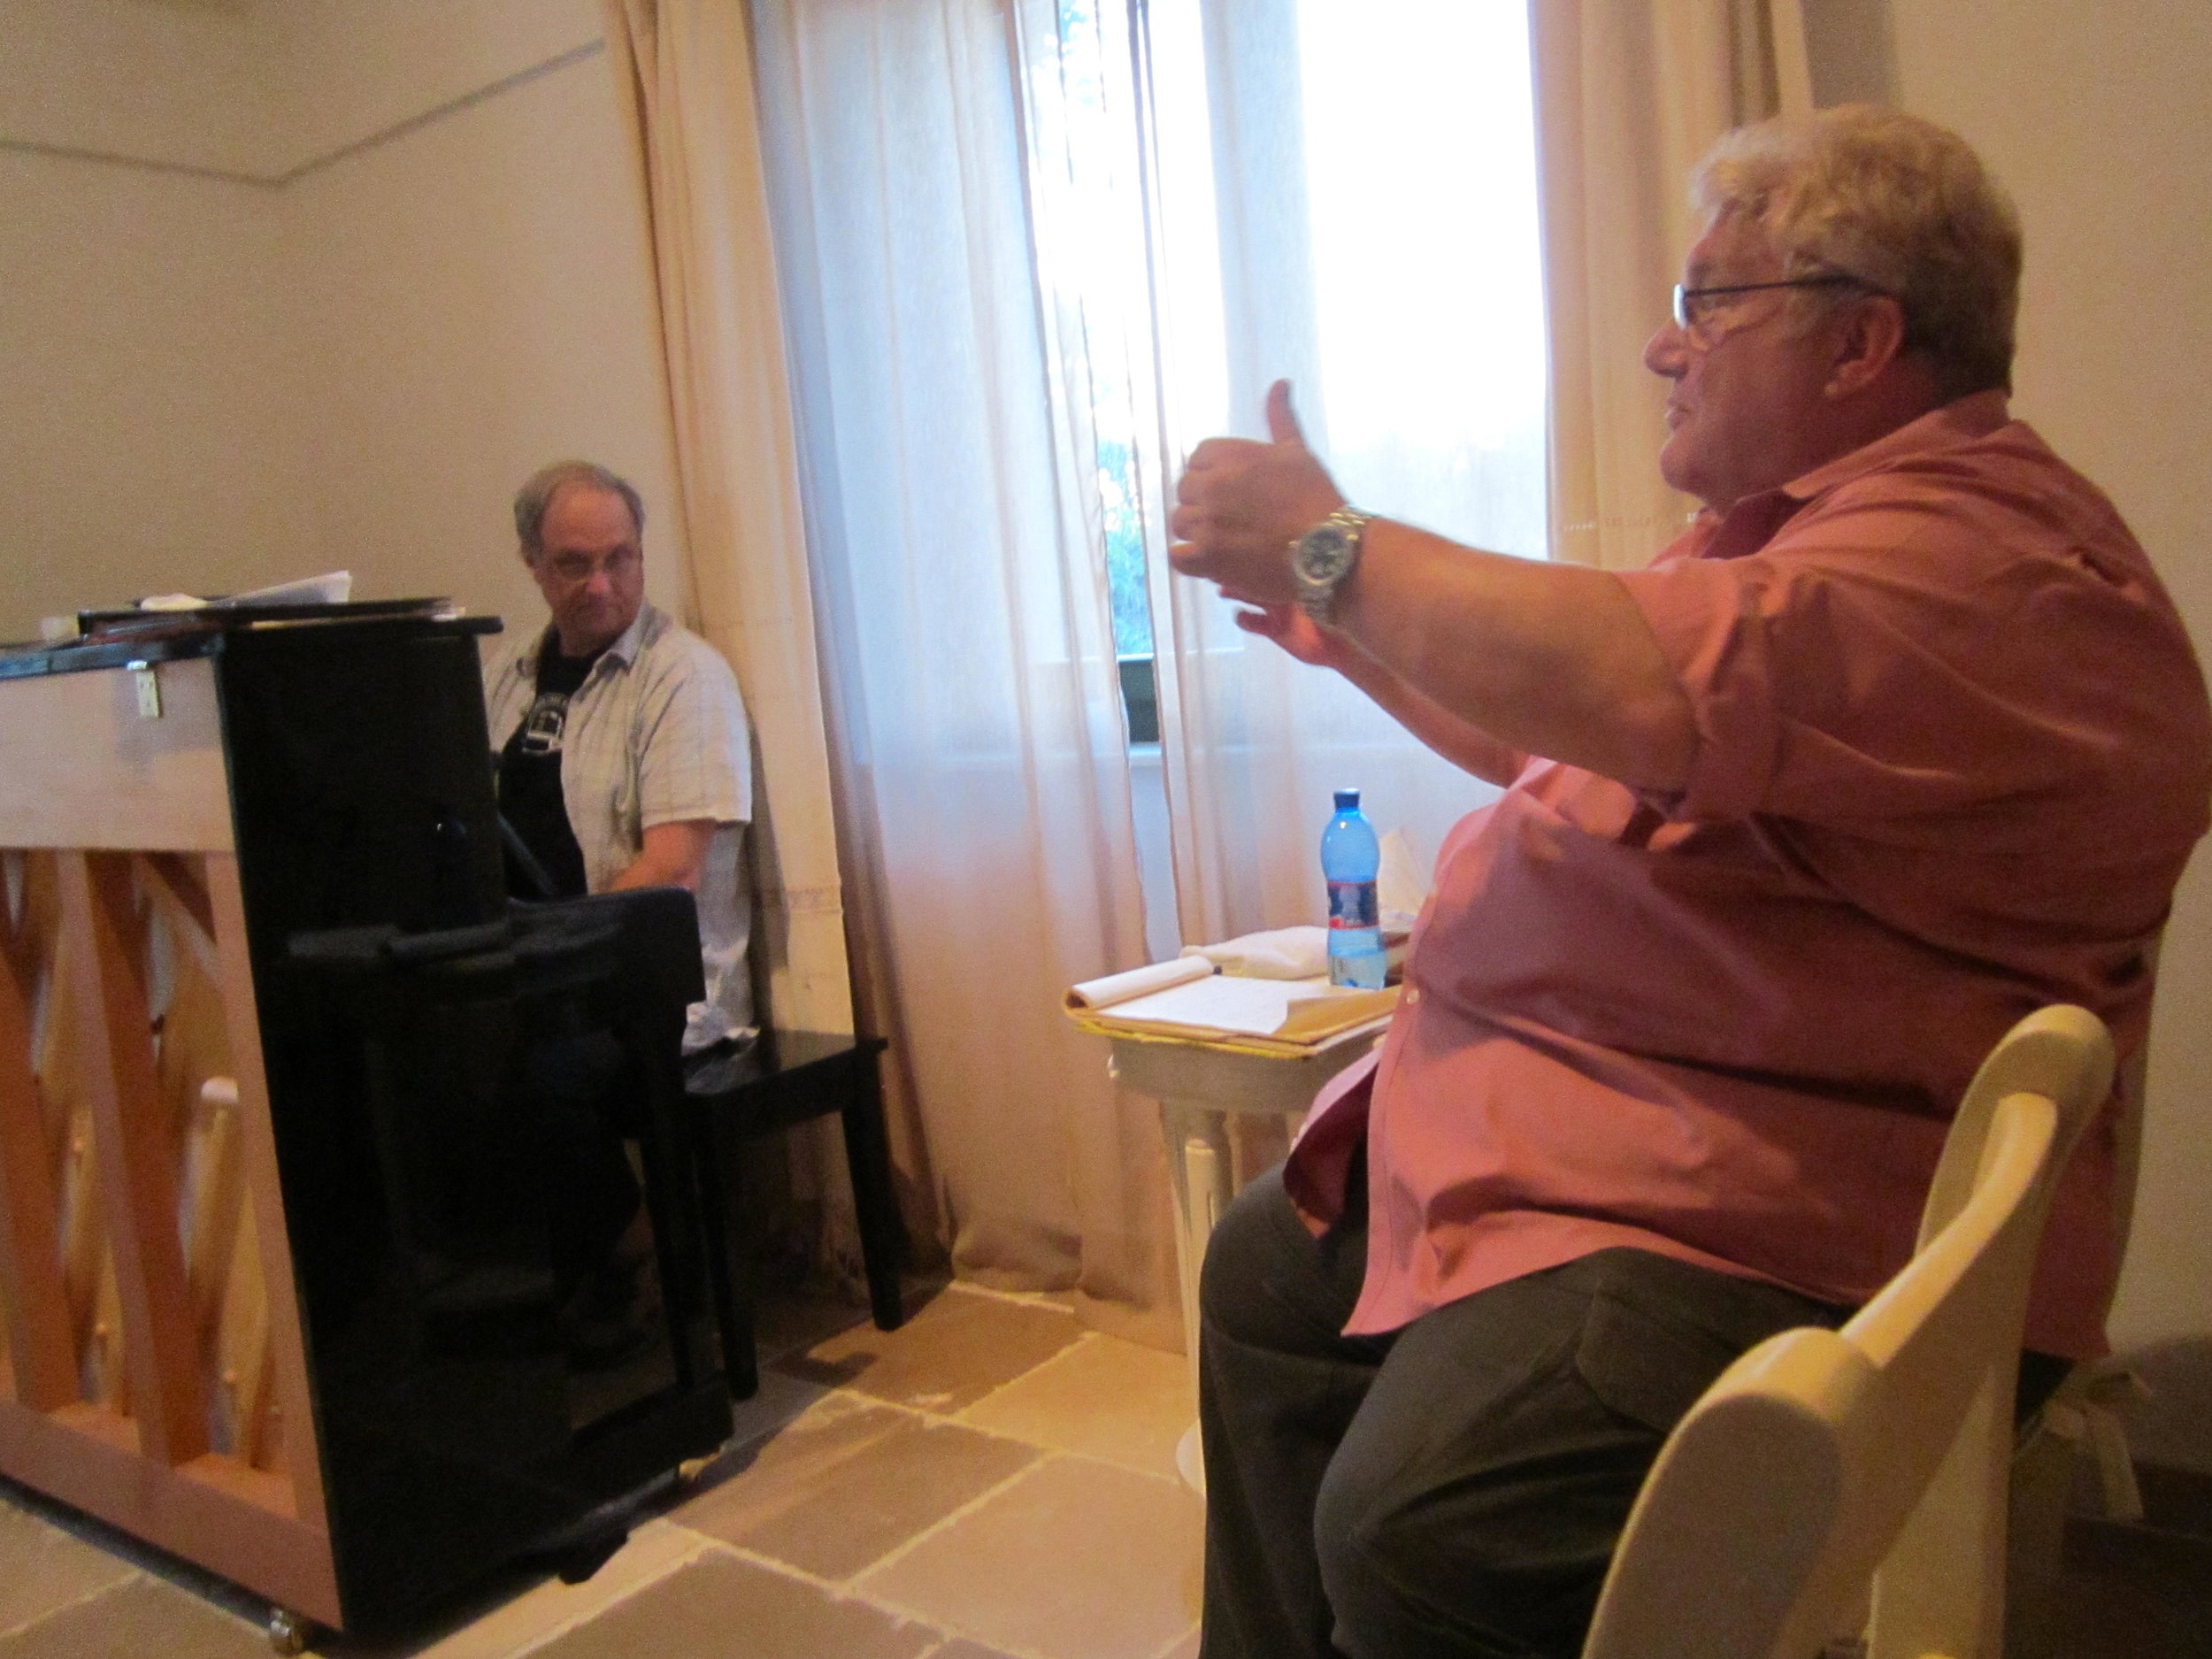 Atelier Apulia, Italy/ with James Koenig in Rehearsal